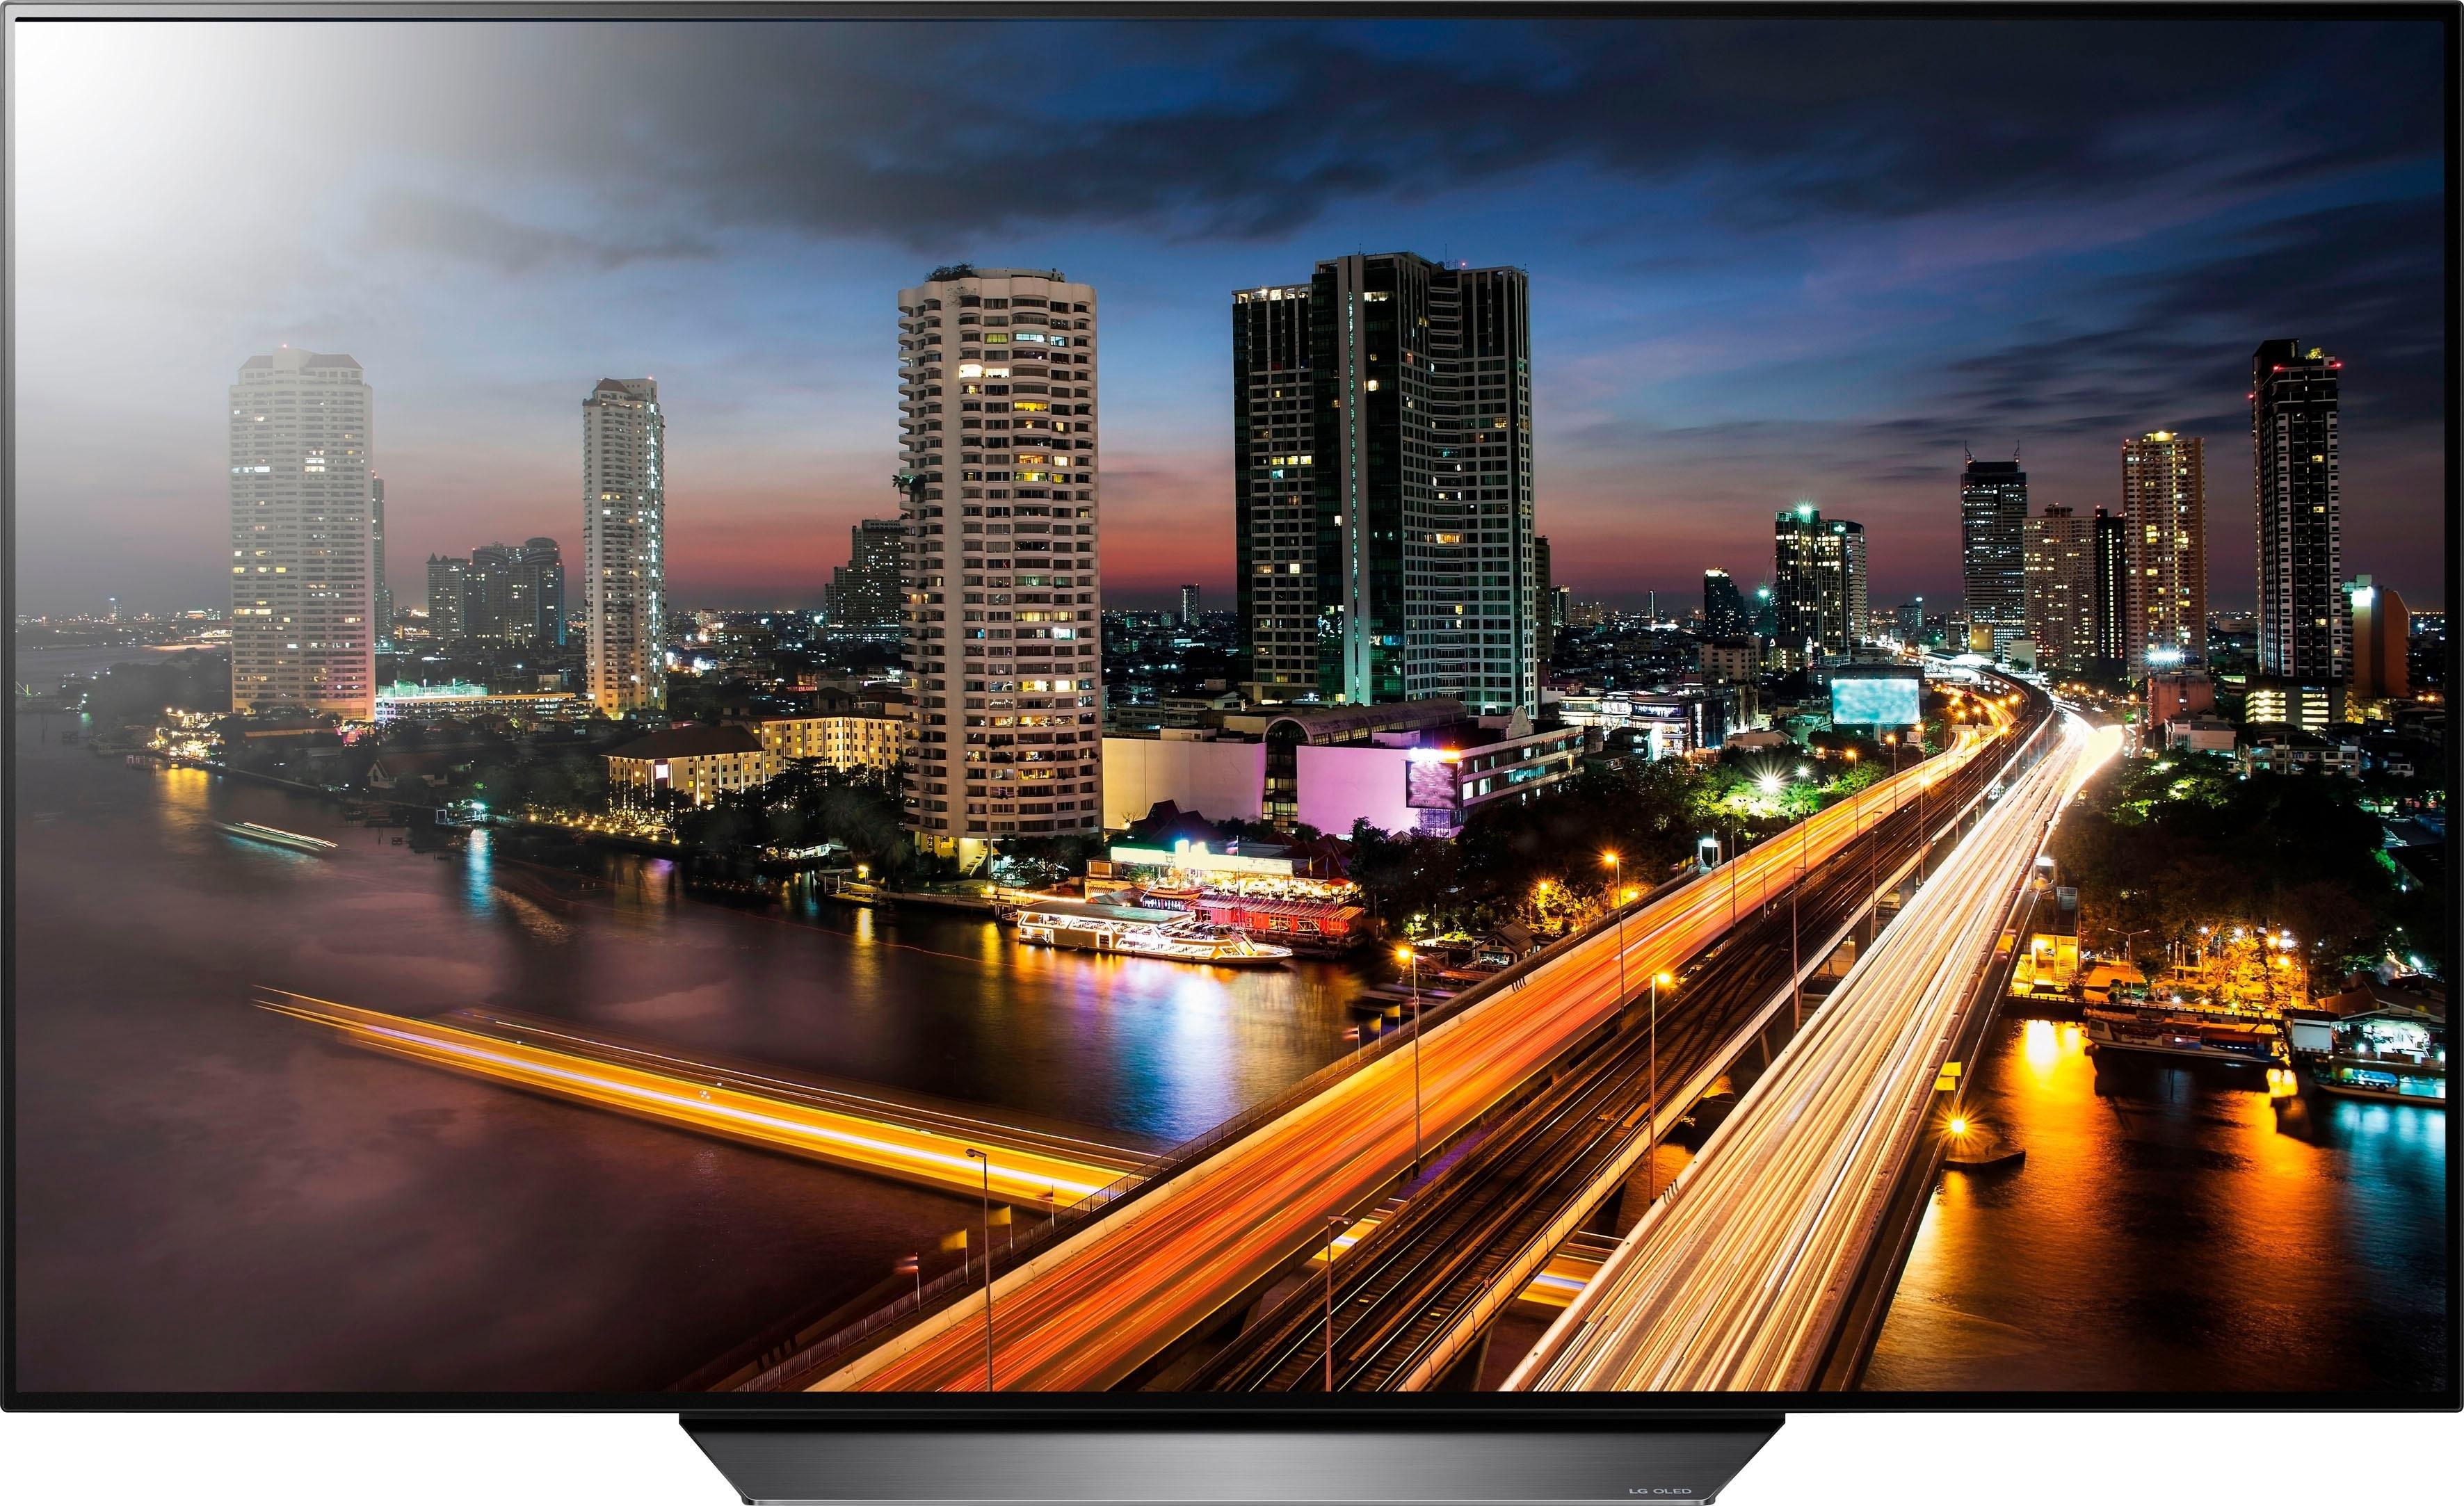 LG OLED65B8LLA oled-tv (65 inch), 4K Ultra HD, smart-tv - gratis ruilen op otto.nl